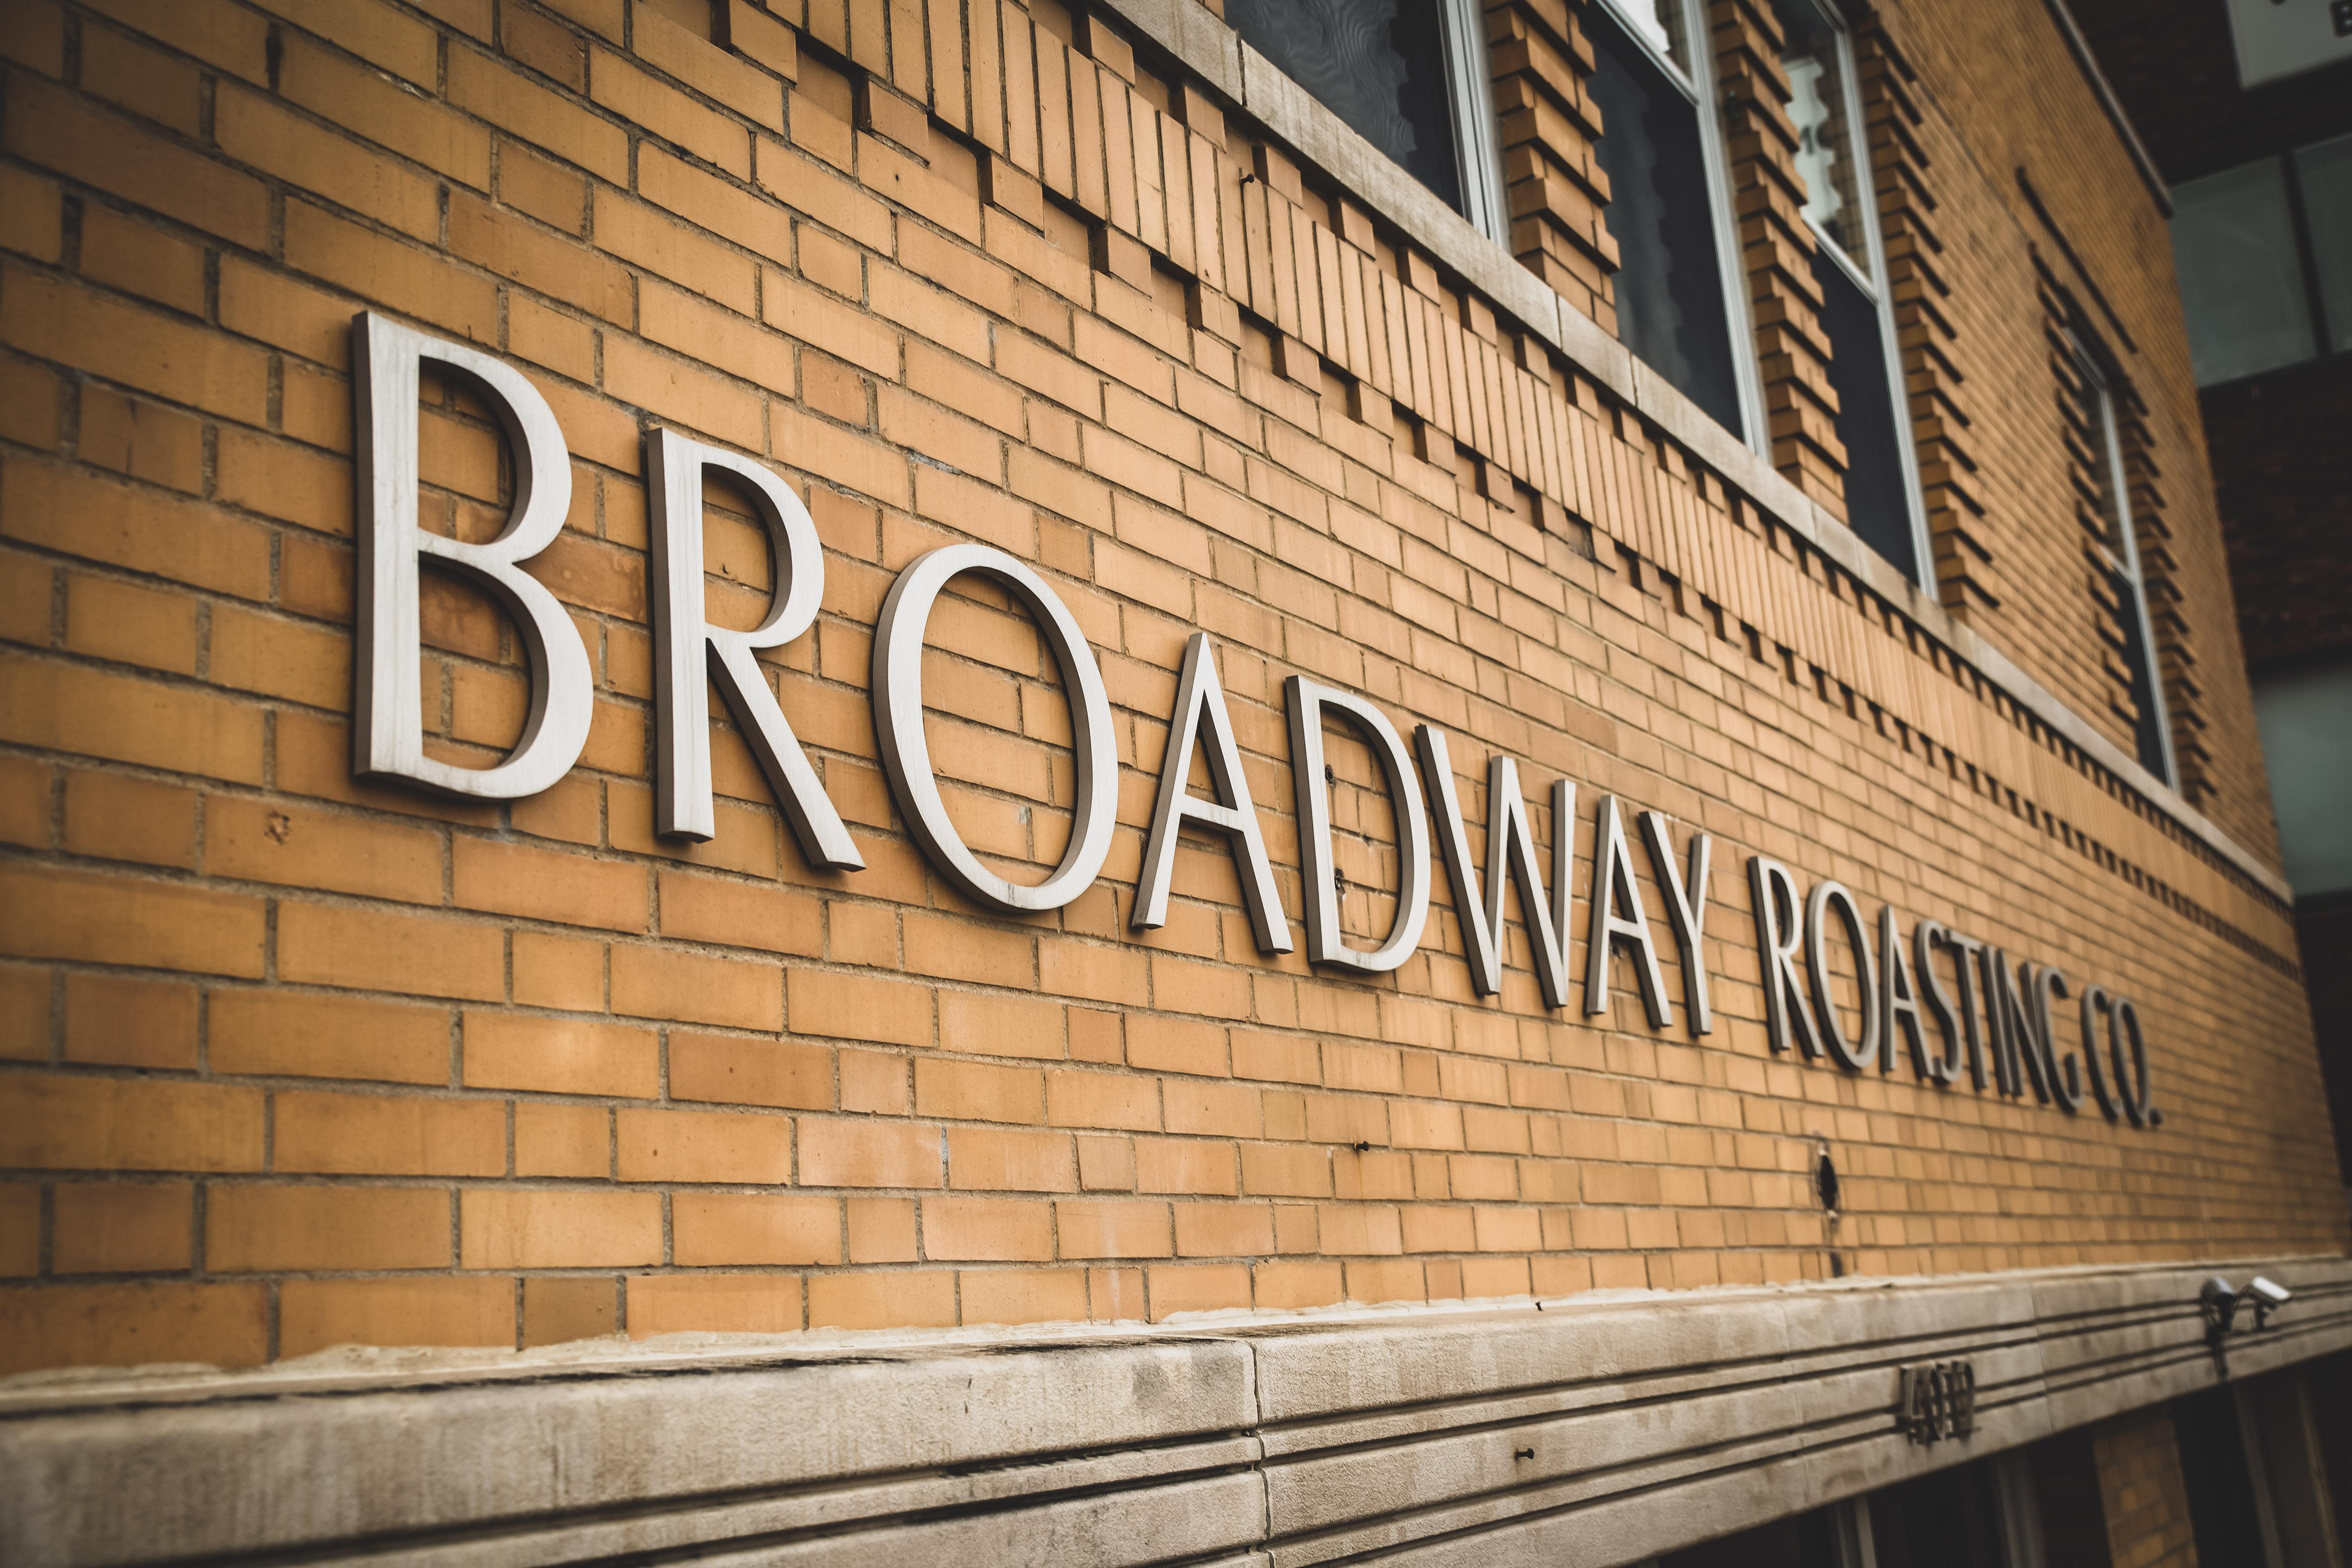 hb_broadway-40